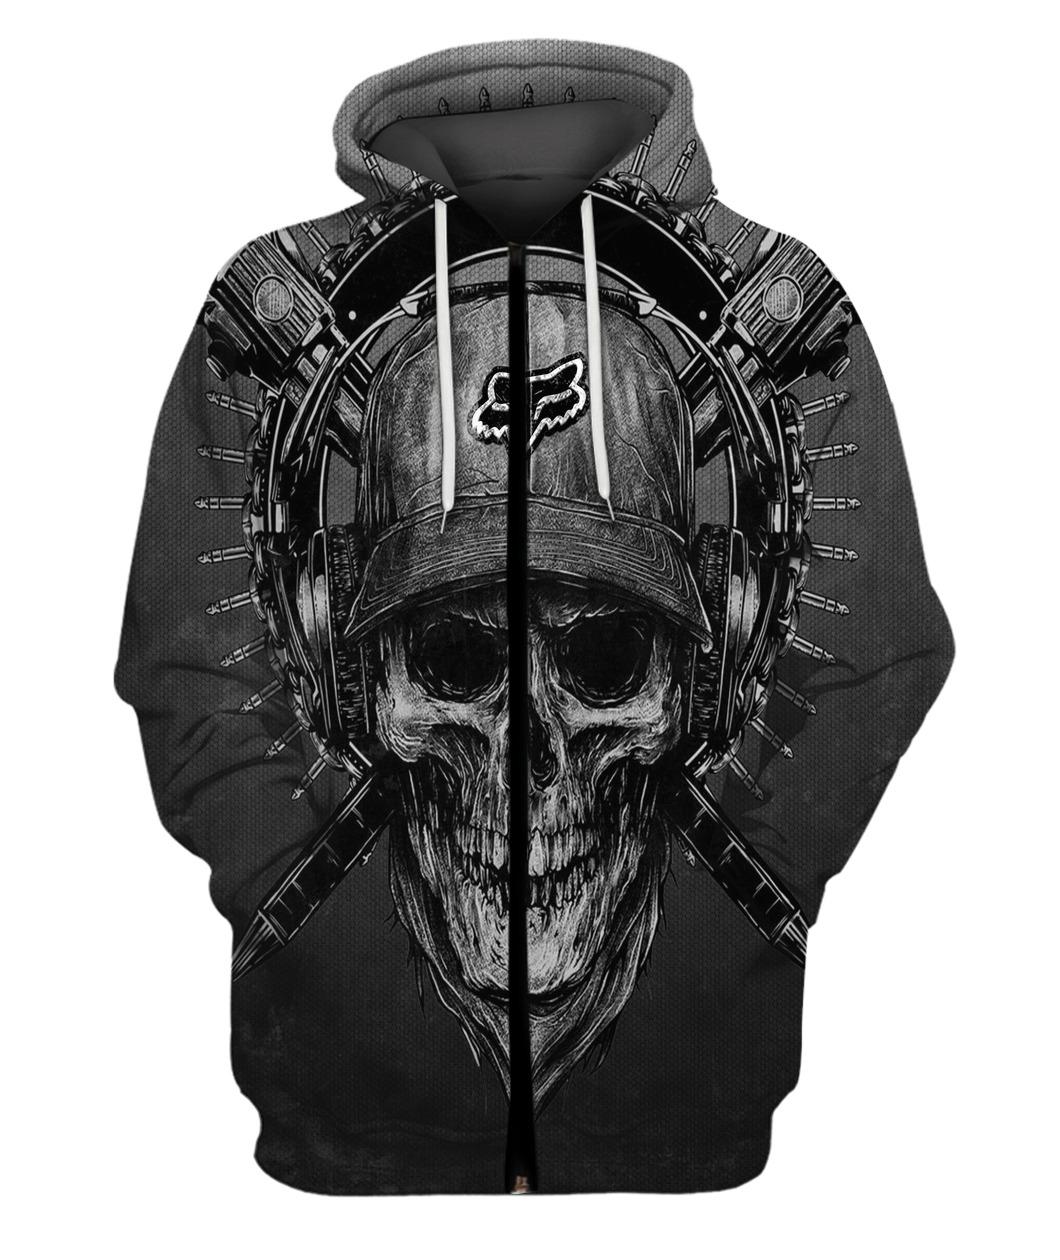 Terror noise division fox racing all over print zip hoodie